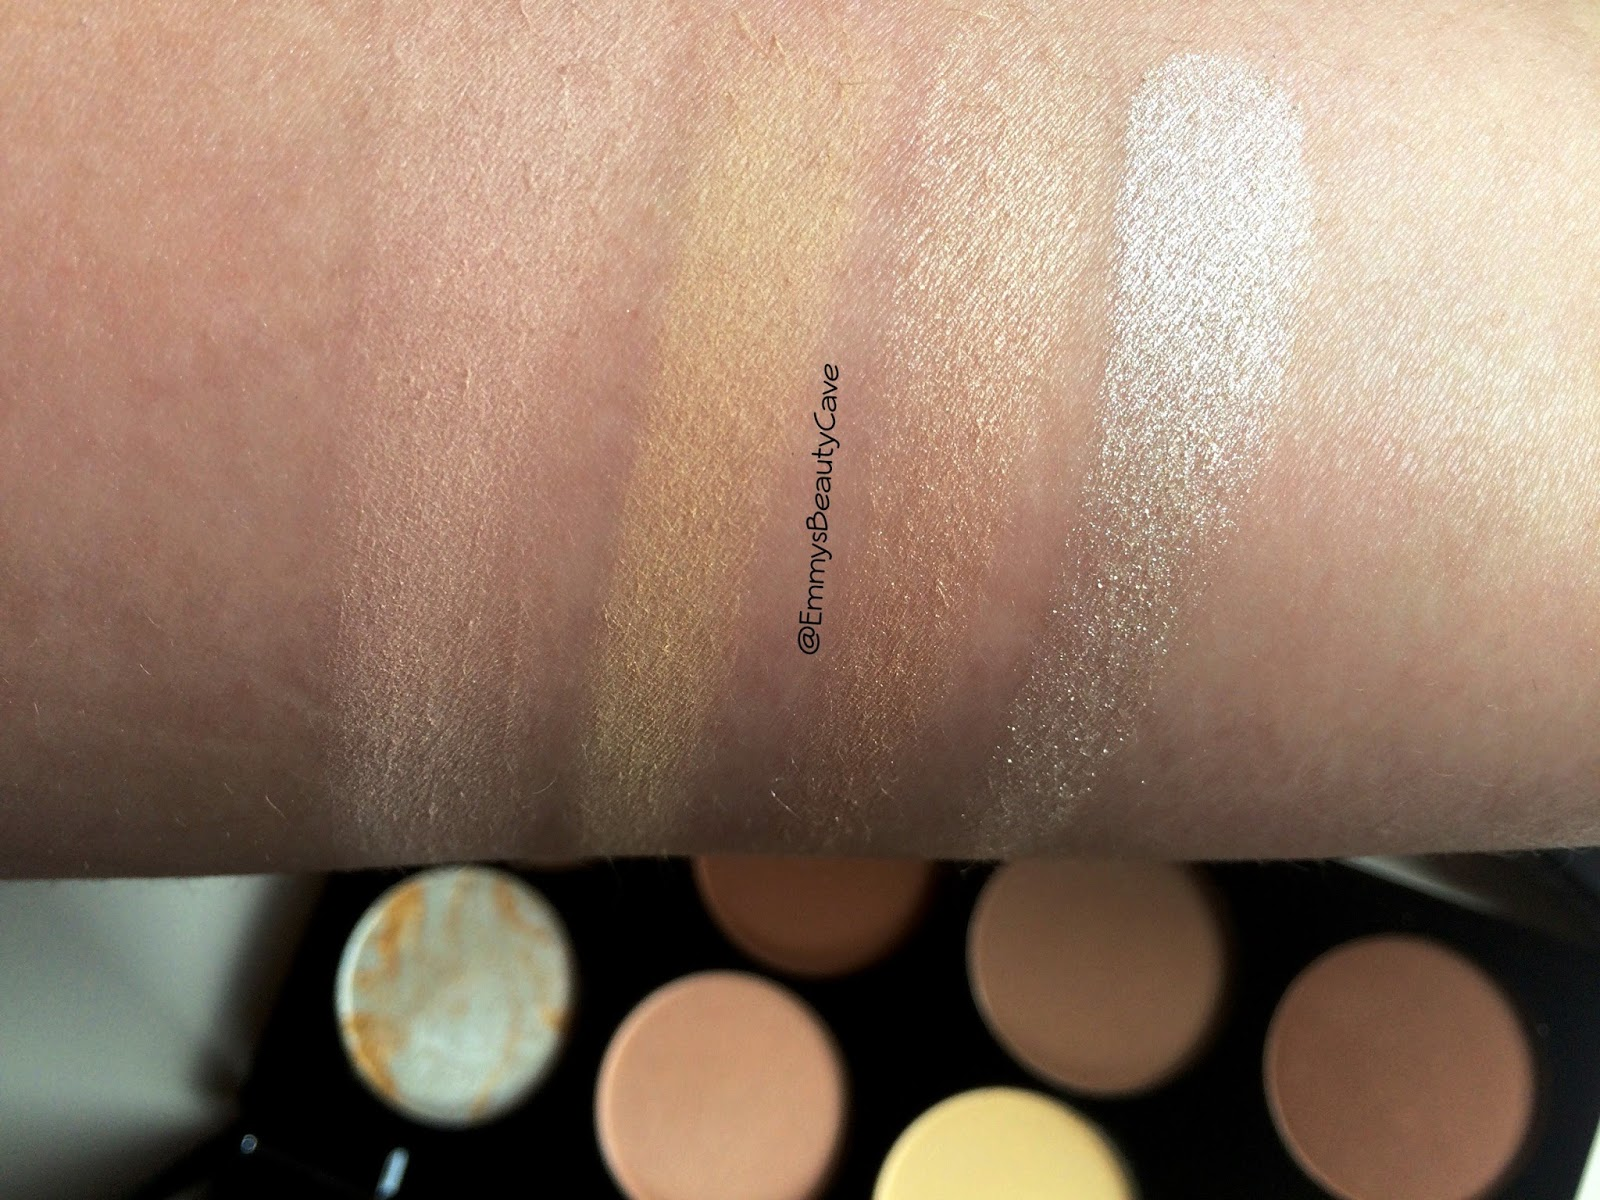 Ultra Cream Contour Palette by Revolution Beauty #11